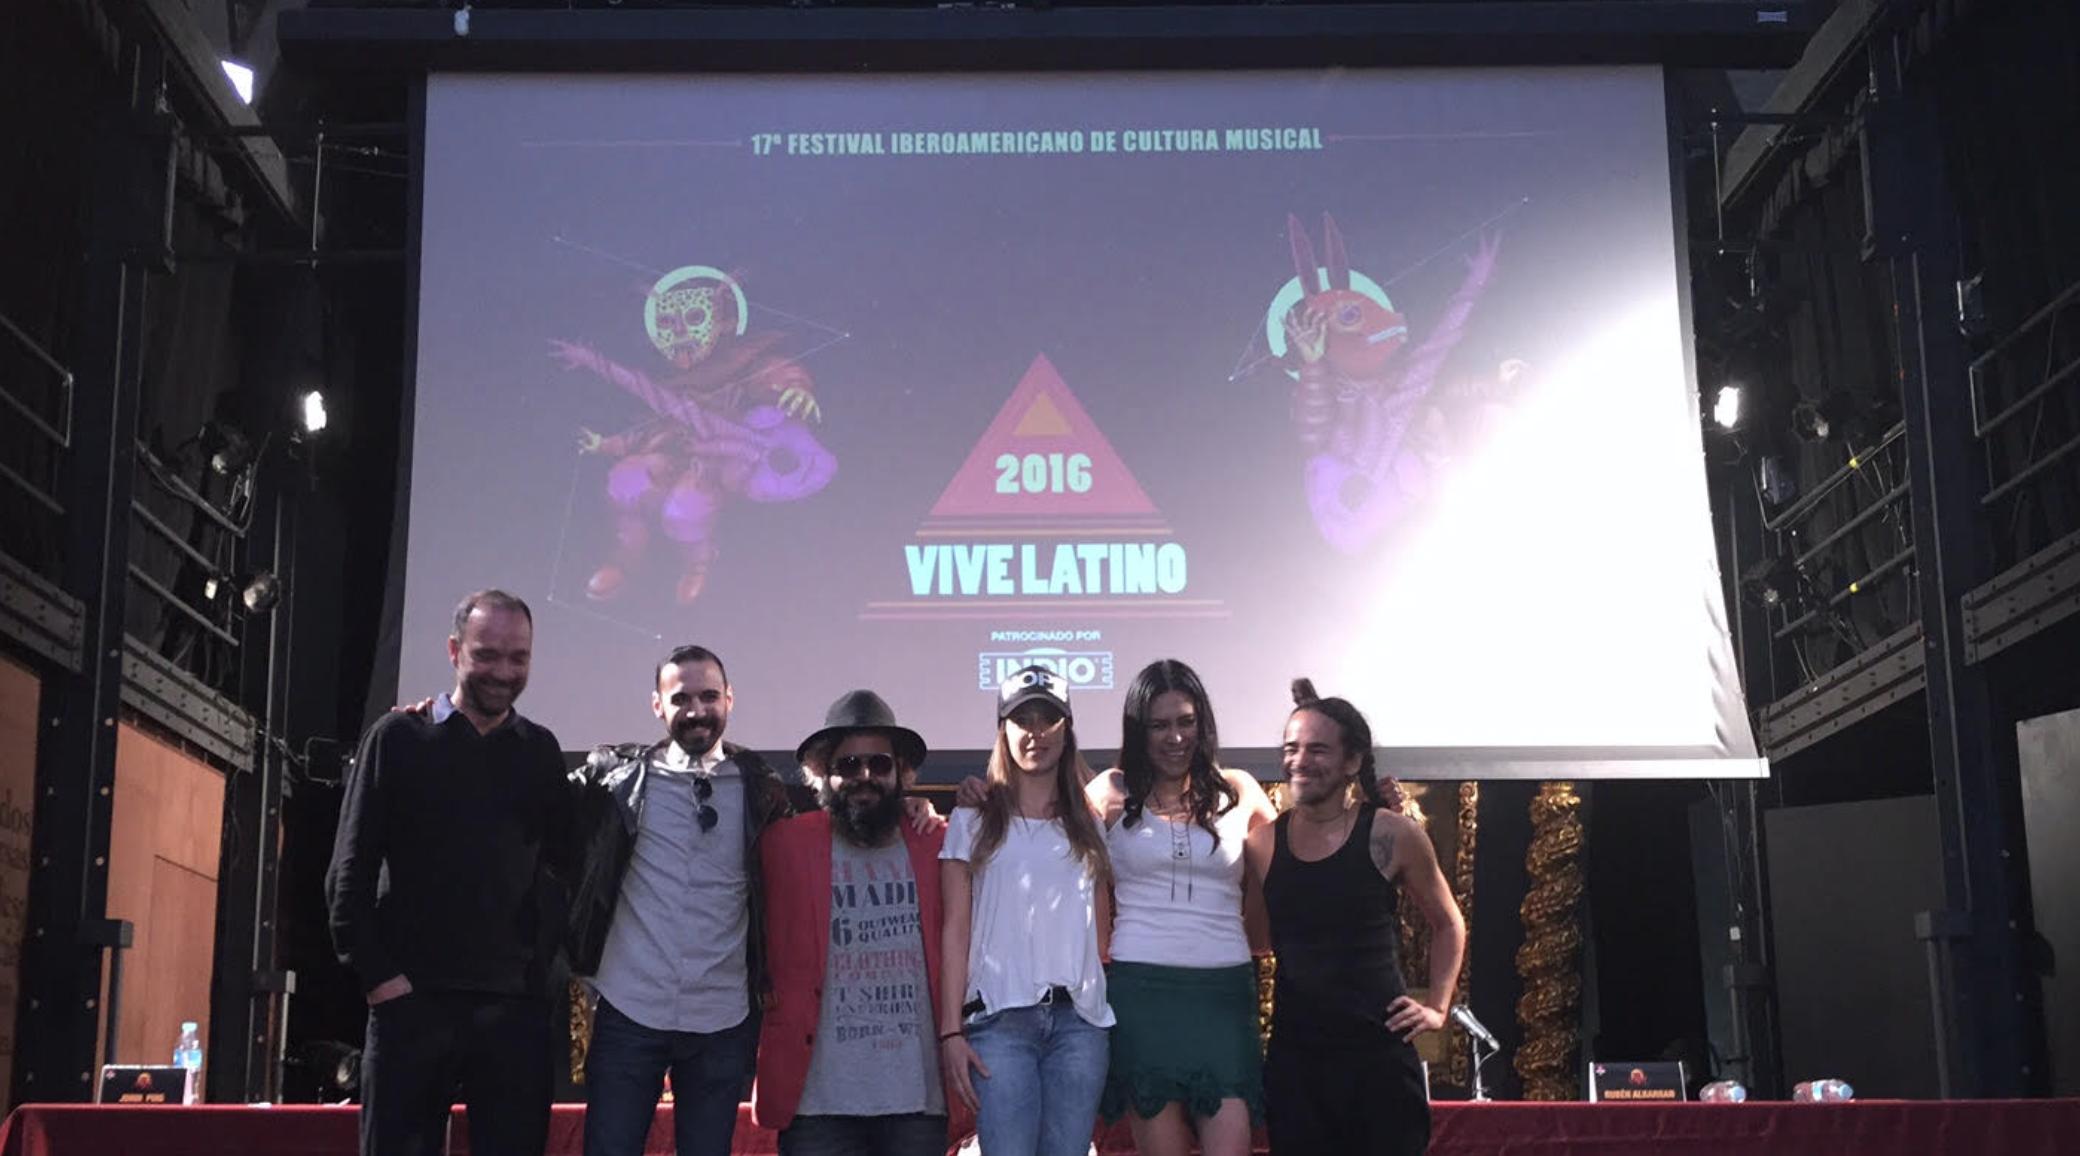 vive latino - clan de clanes - casa comedy - radioalternativo - 2016 - RA - vl16